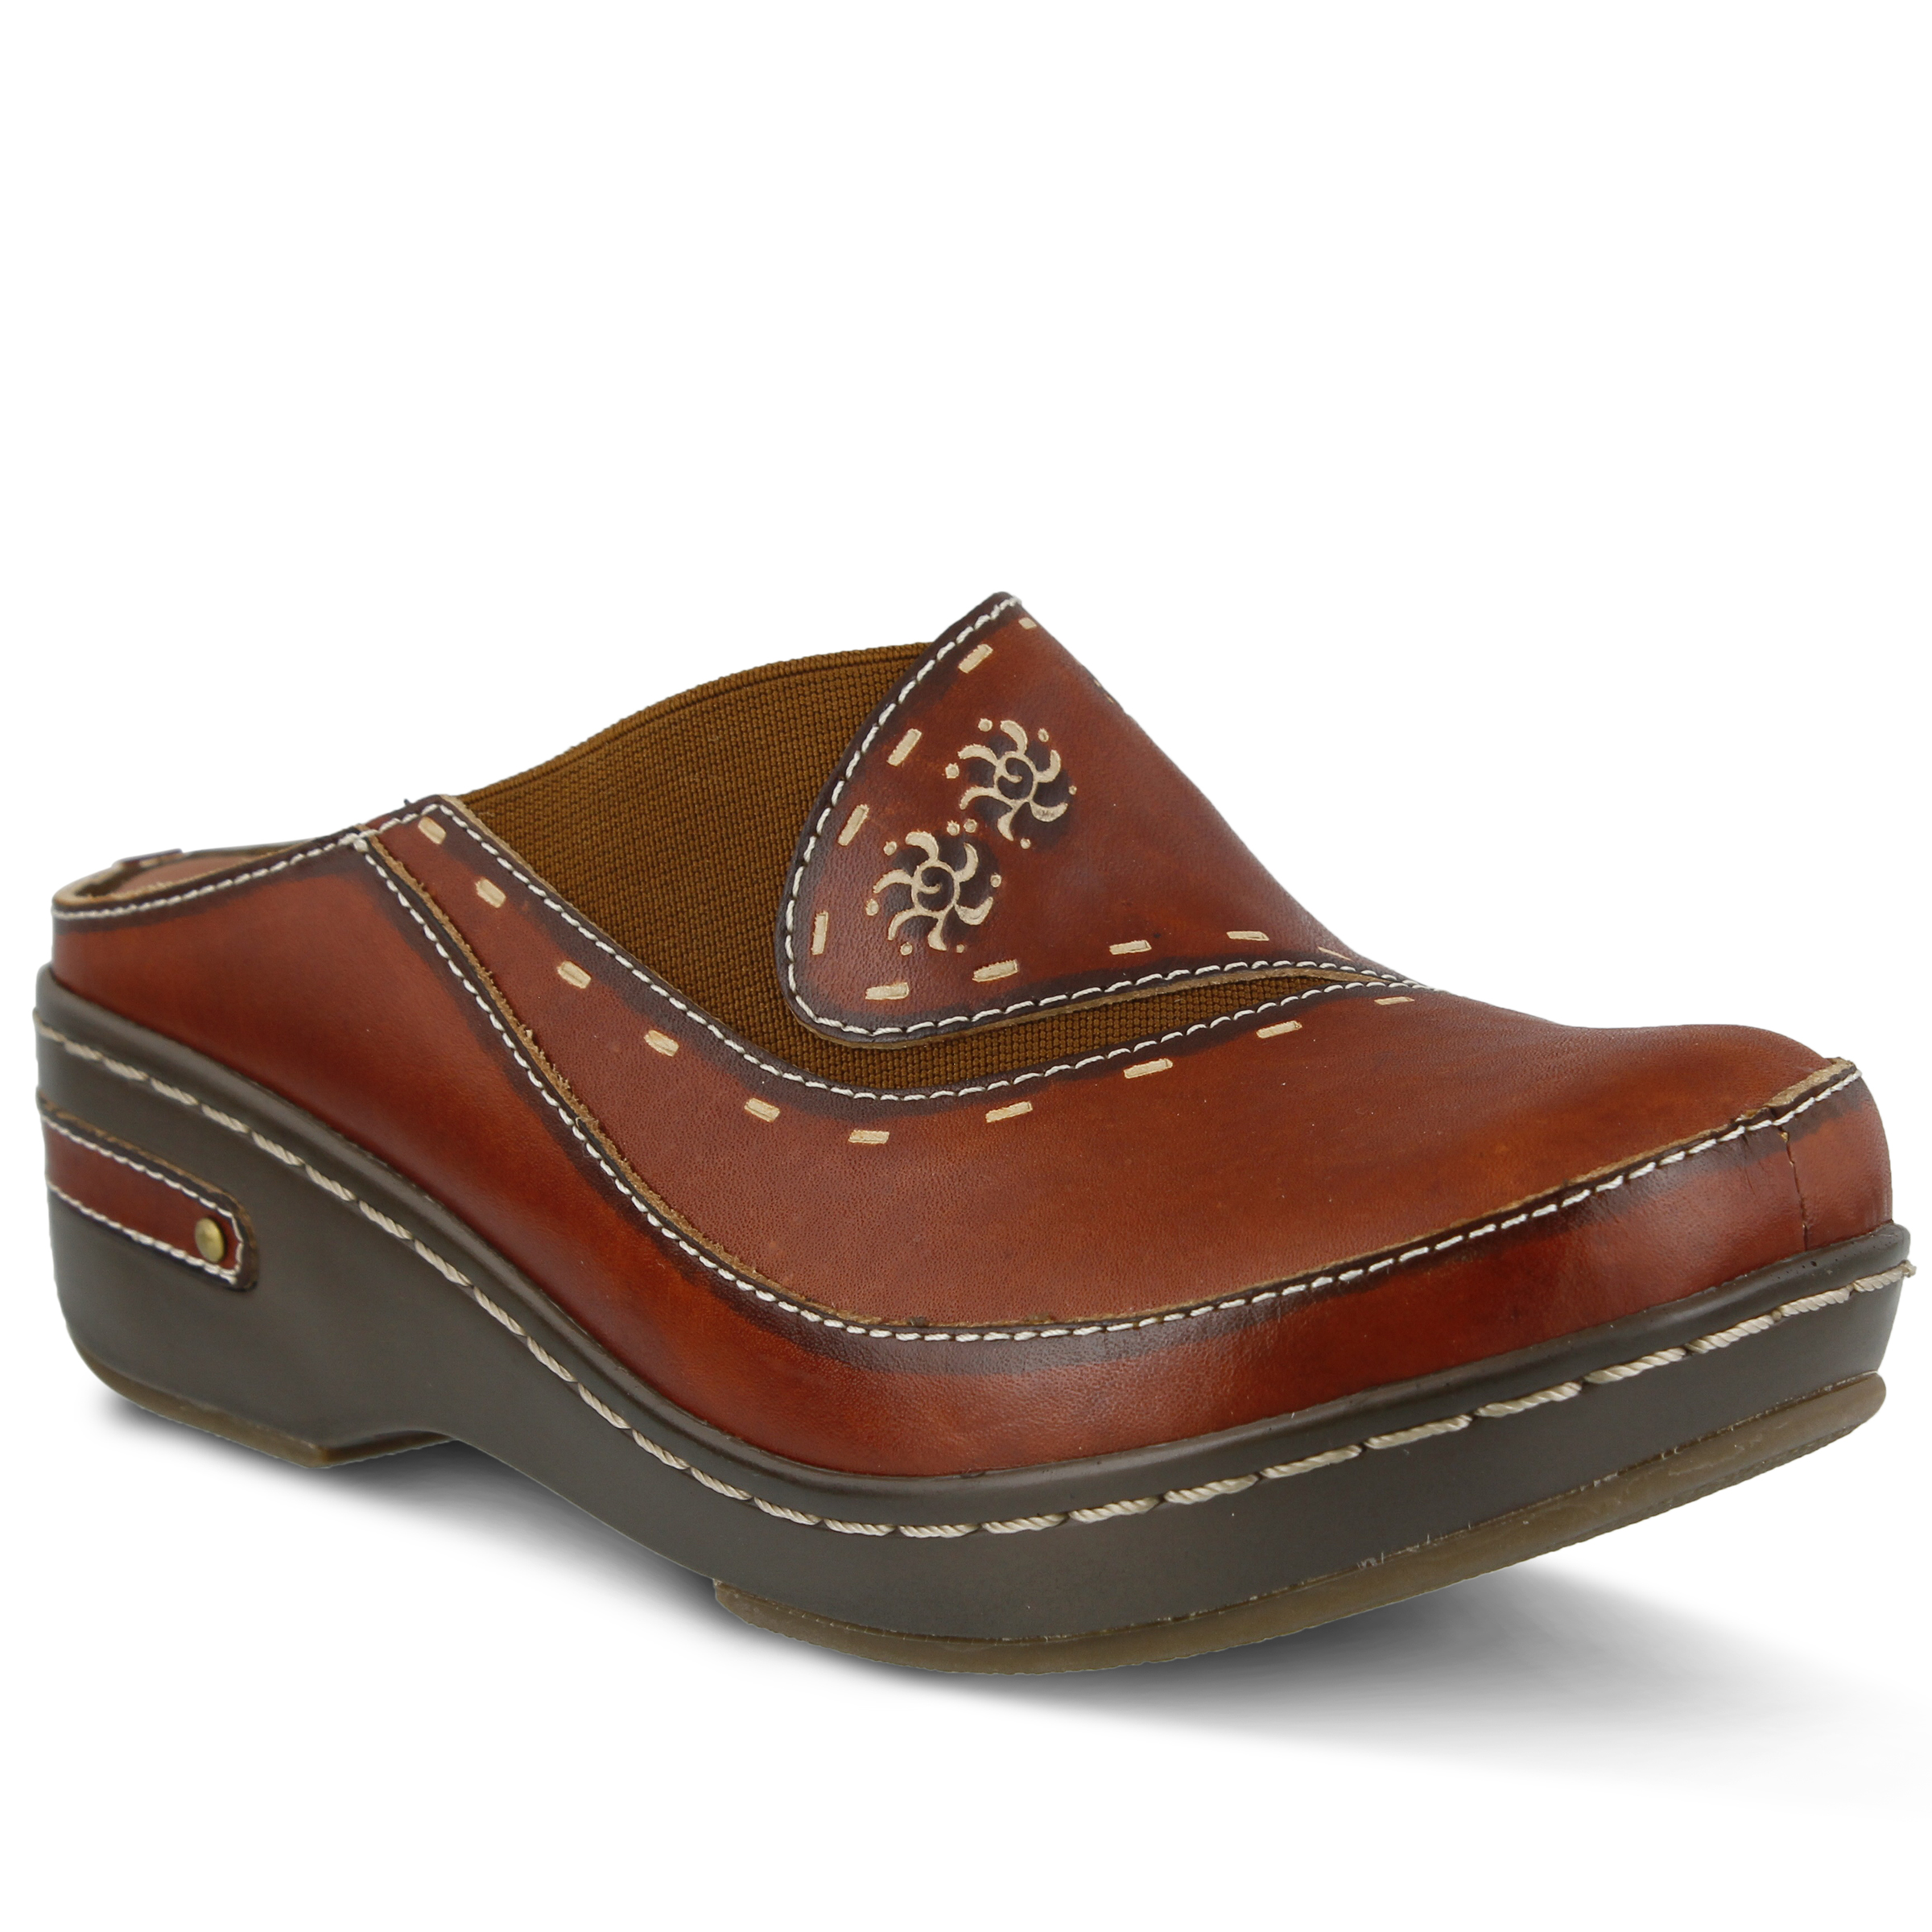 main fitness shoes doctor silver s women comforter comforable xspress runner womens blue comfort